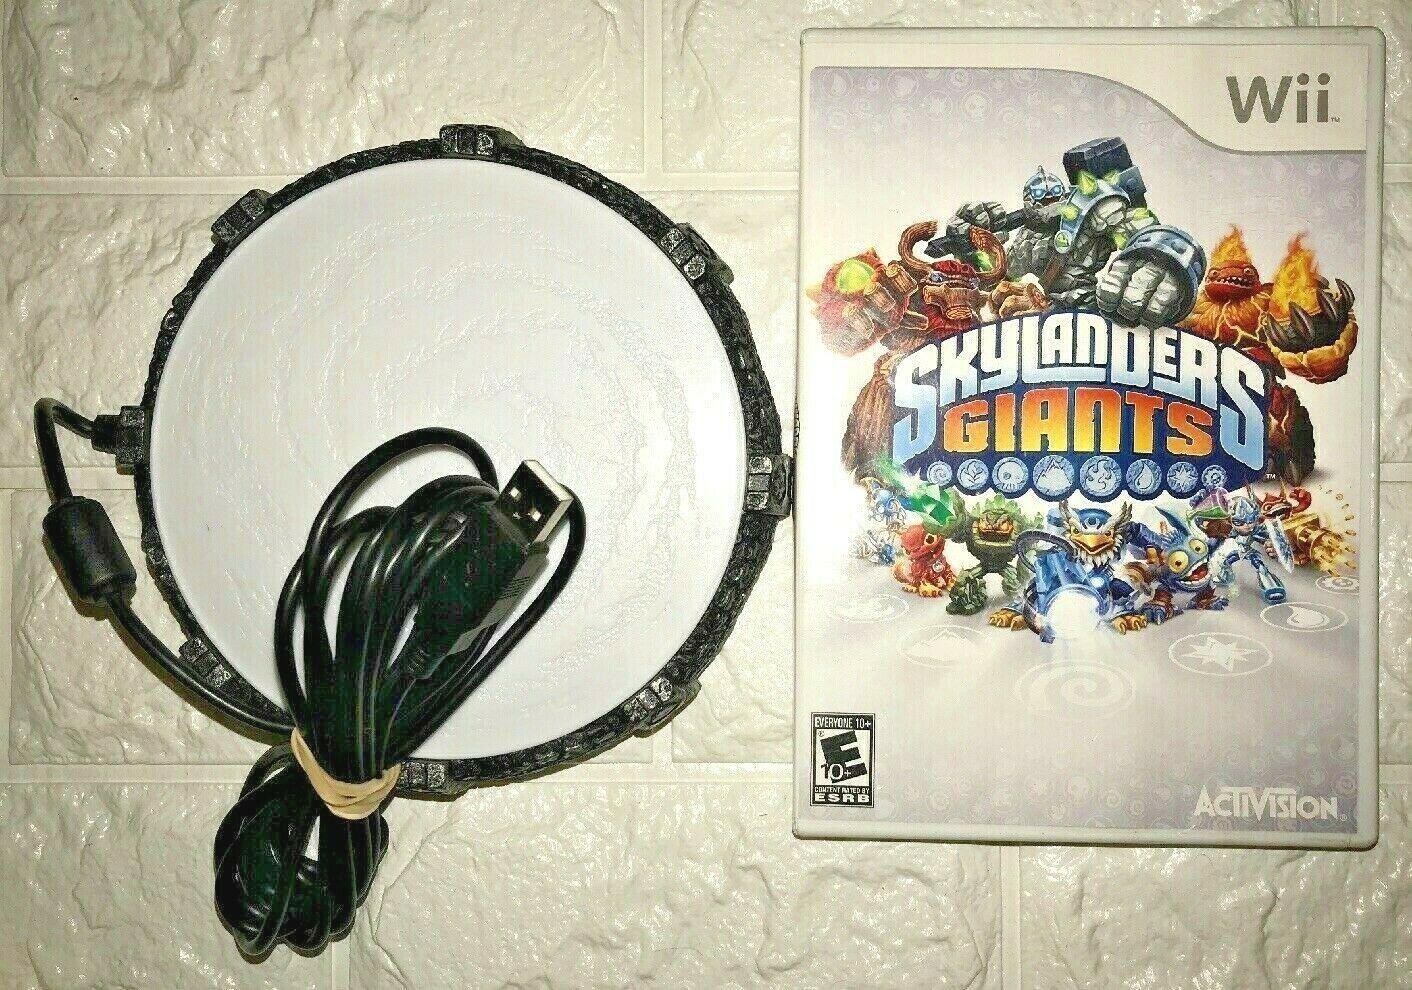 Skylanders GIANTS Nintendo Wii 2012 Game Complete W/ Disc and Portal Of Power